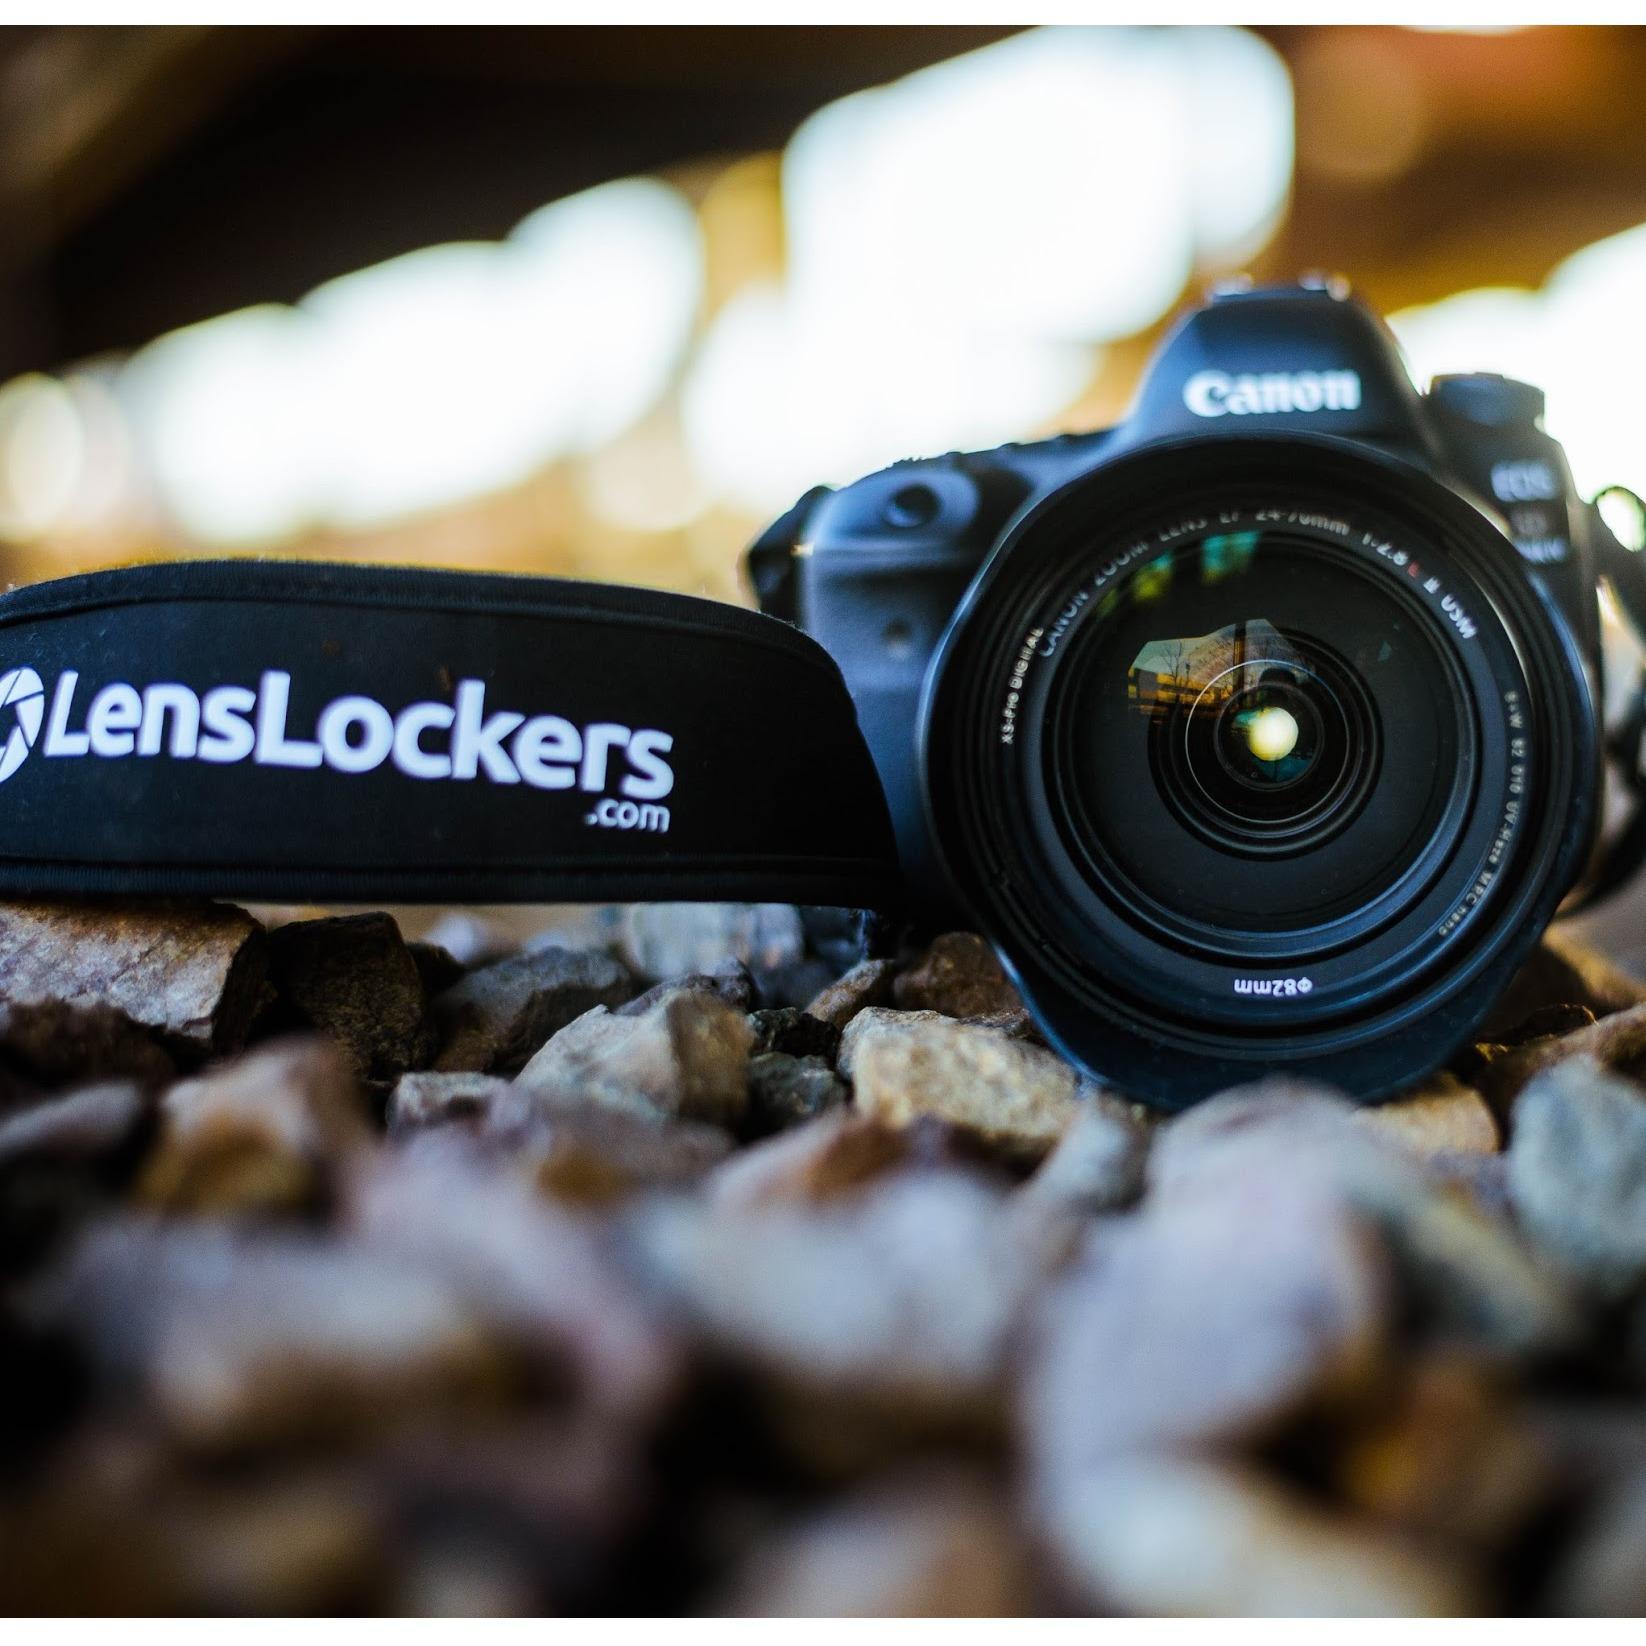 LensLockers